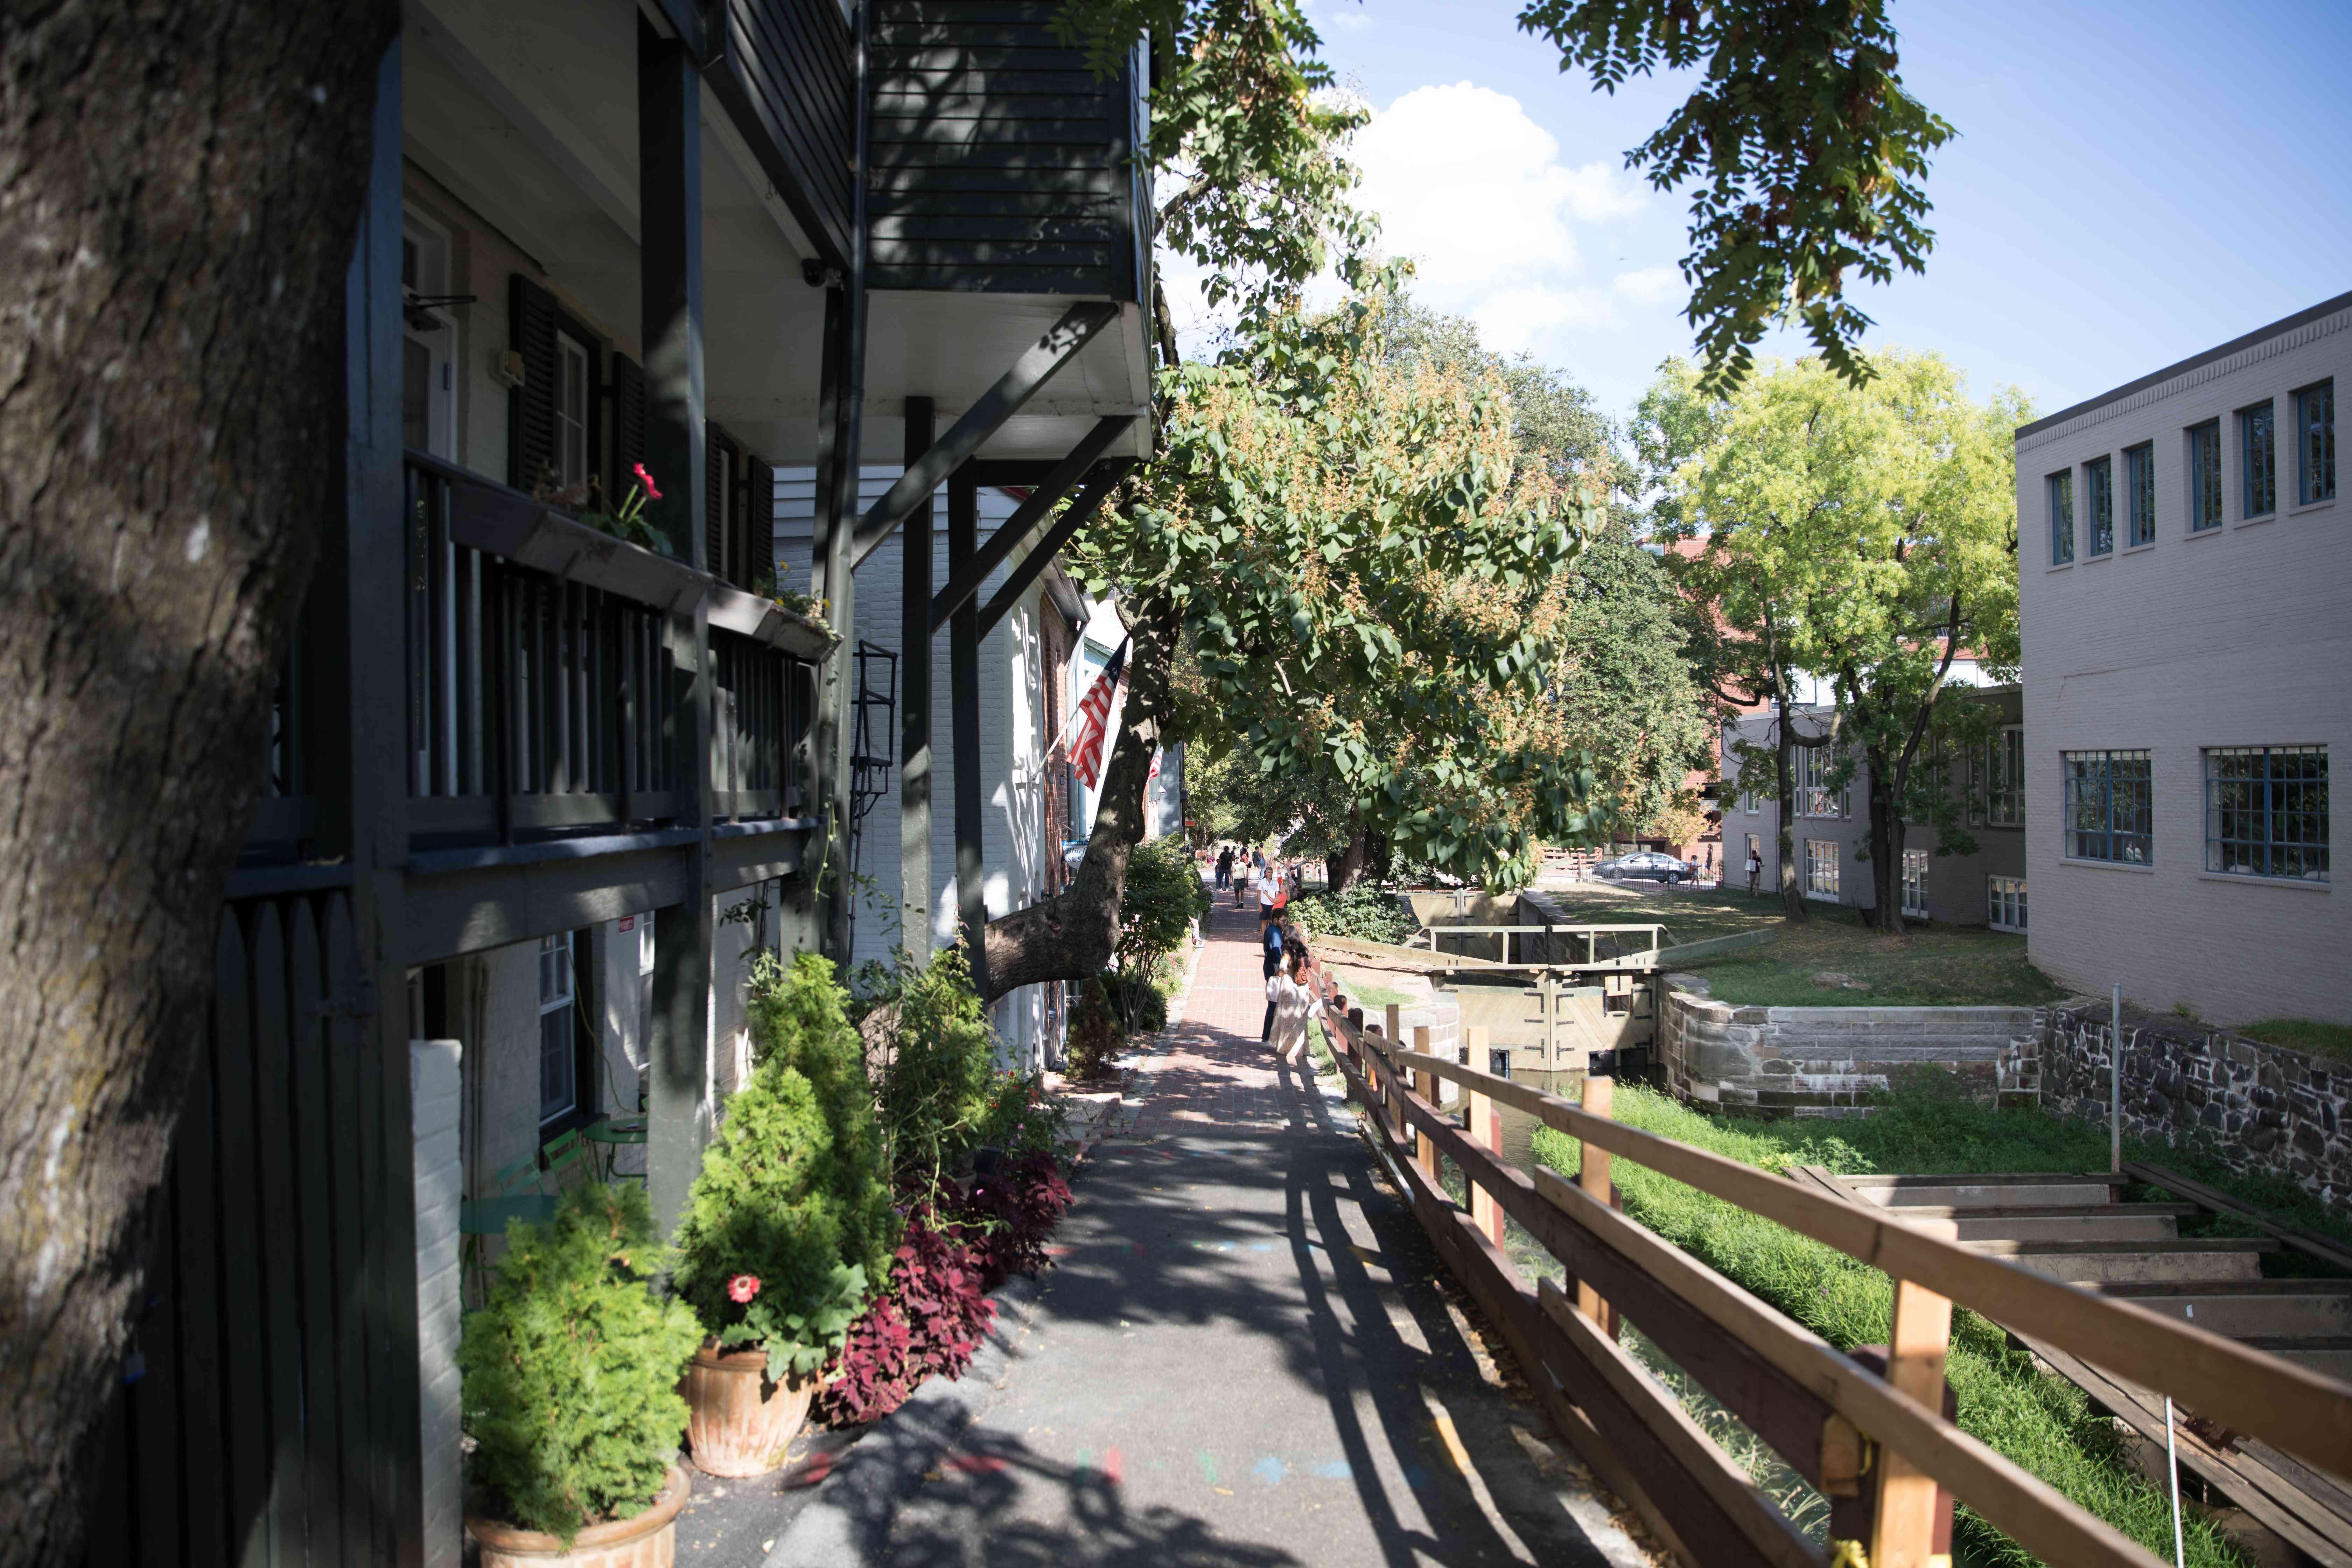 People walking along the sidewalk by historic houses in Georgetown